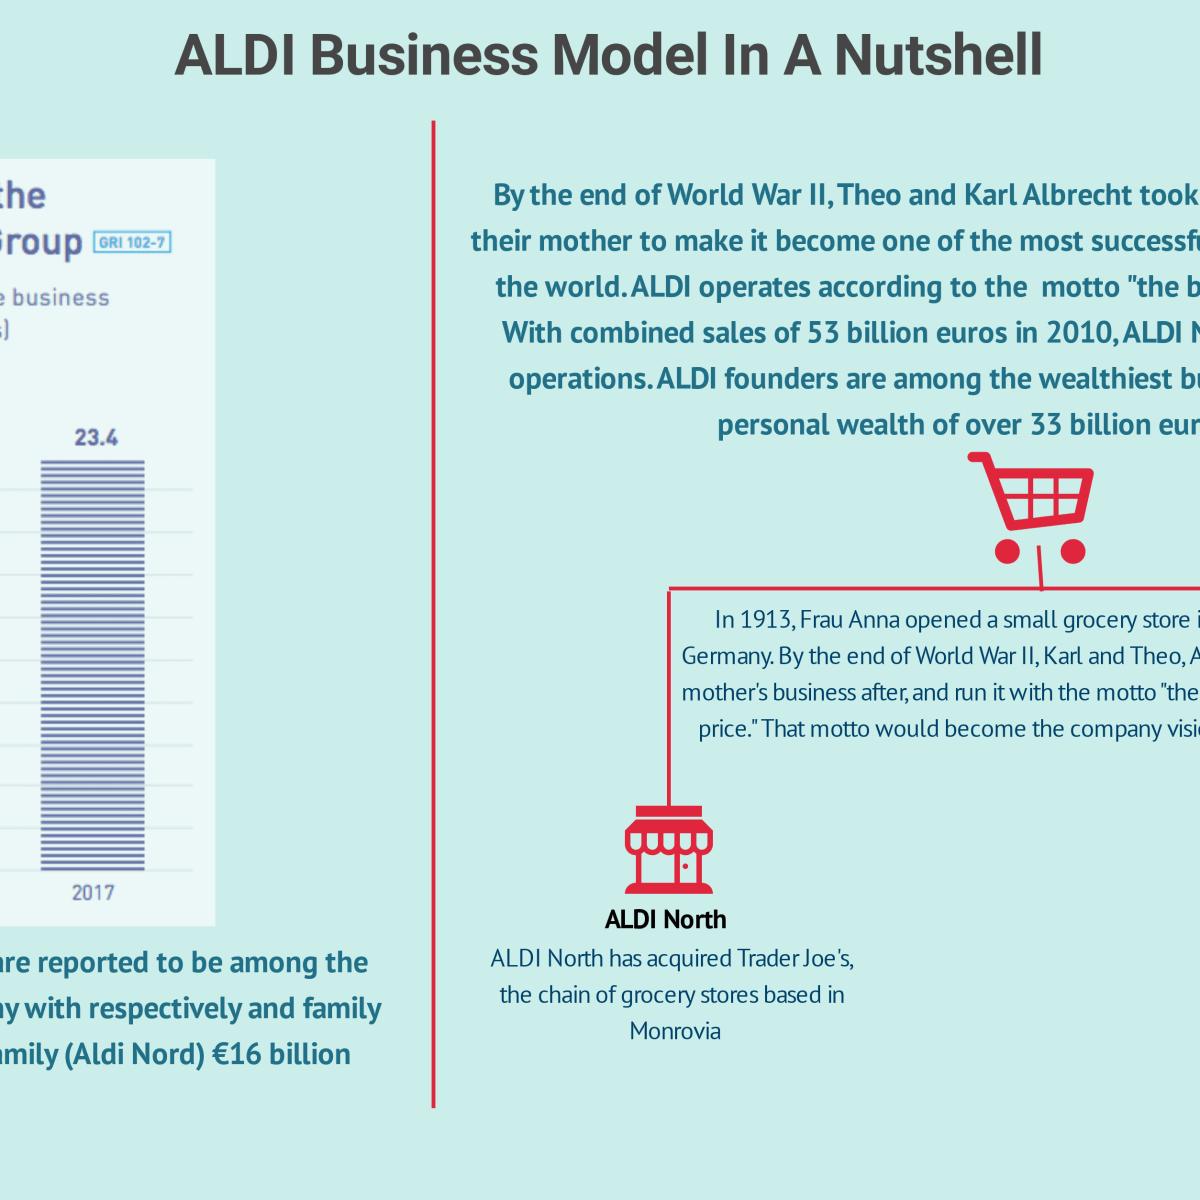 ALDI Business Model In A Nutshell | FourWeekMBA